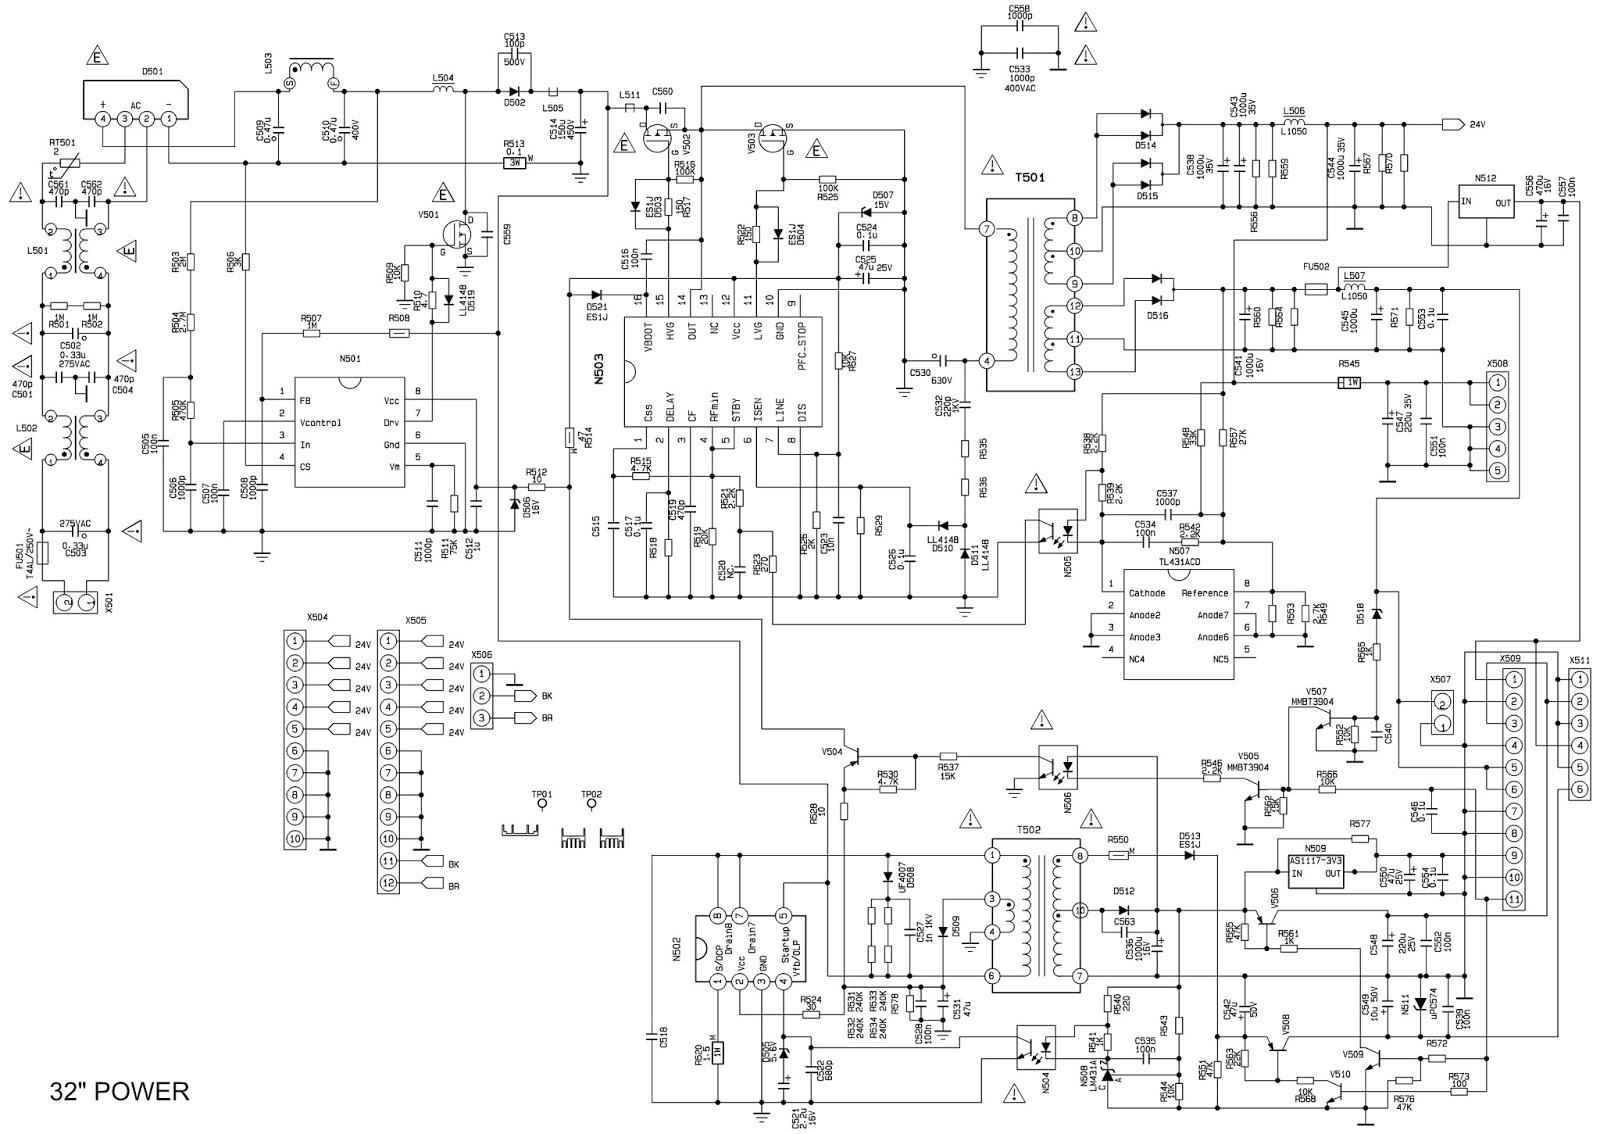 bbk lt 3210 lcd tv 32 power supply 26 power supply 26 t rh electronicshelponline blogspot com 3000W Inverter Wiring Diagram Inverter Circuit Diagram